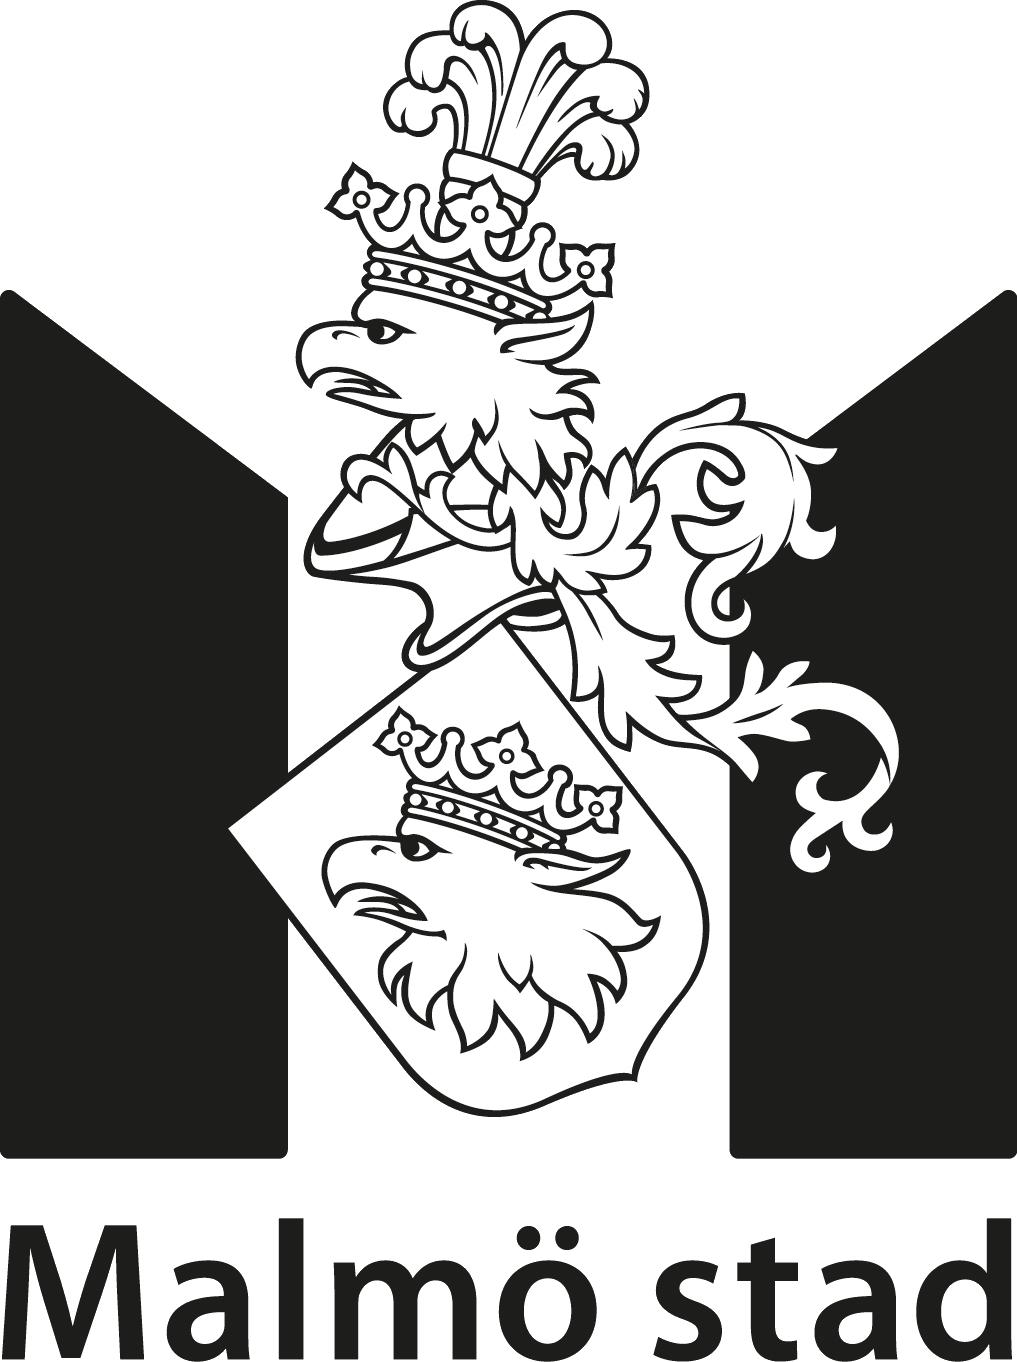 Mamö stad logotyp